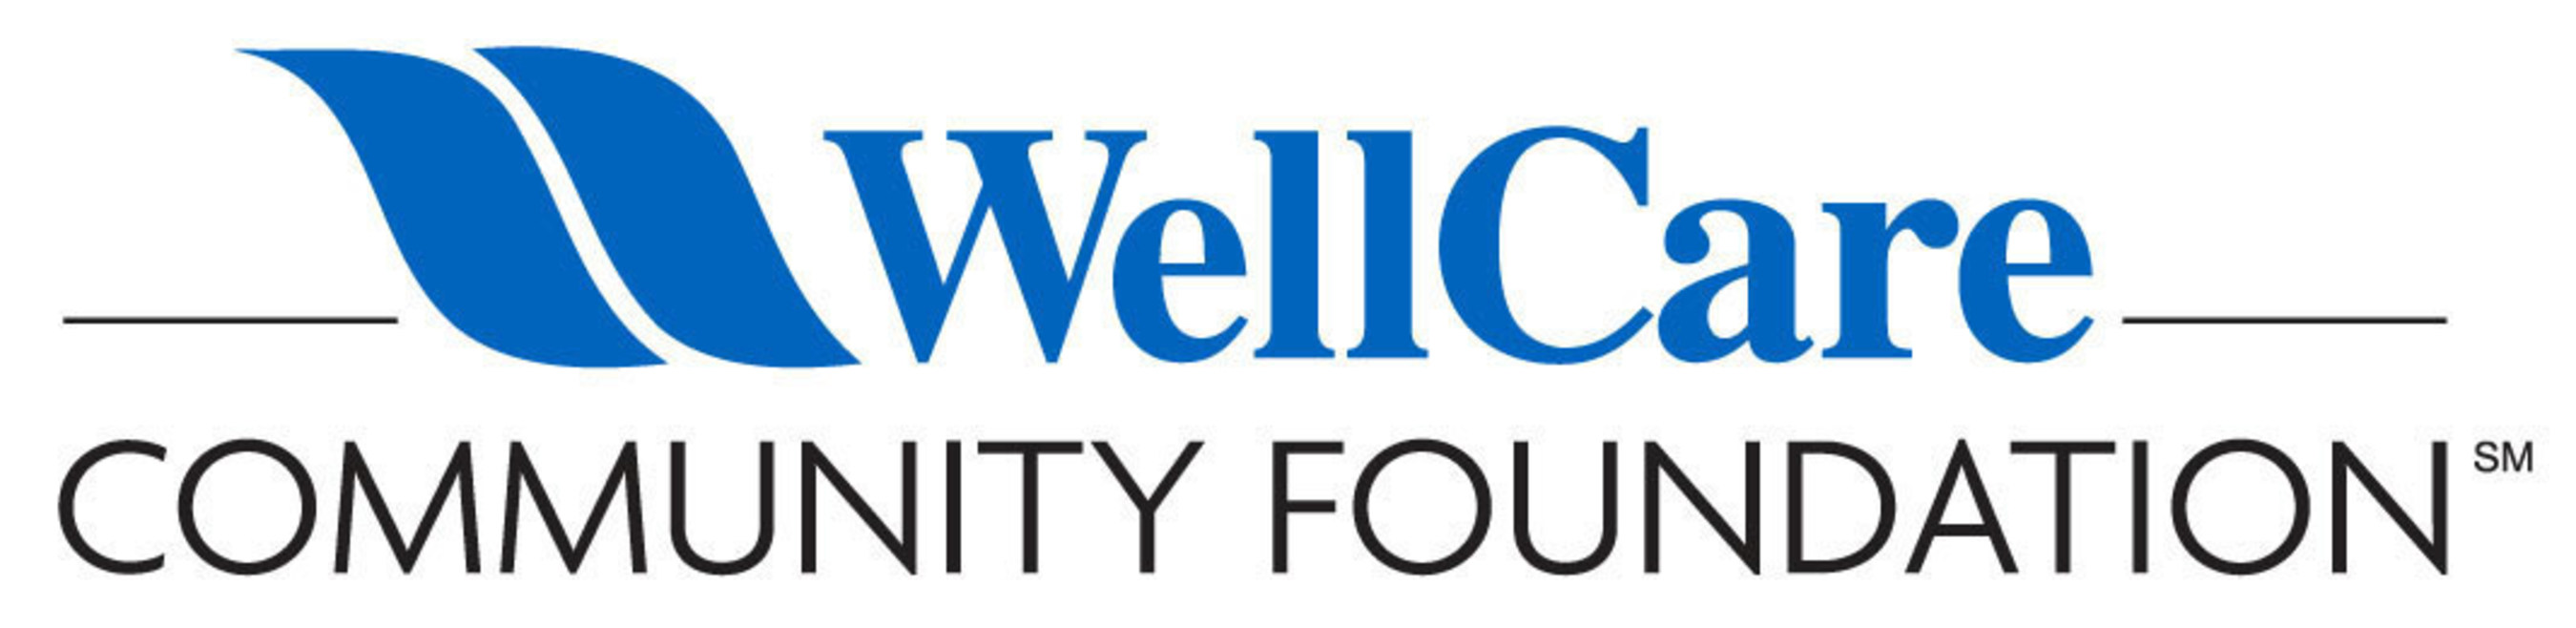 WellCare Community Foundation Logo